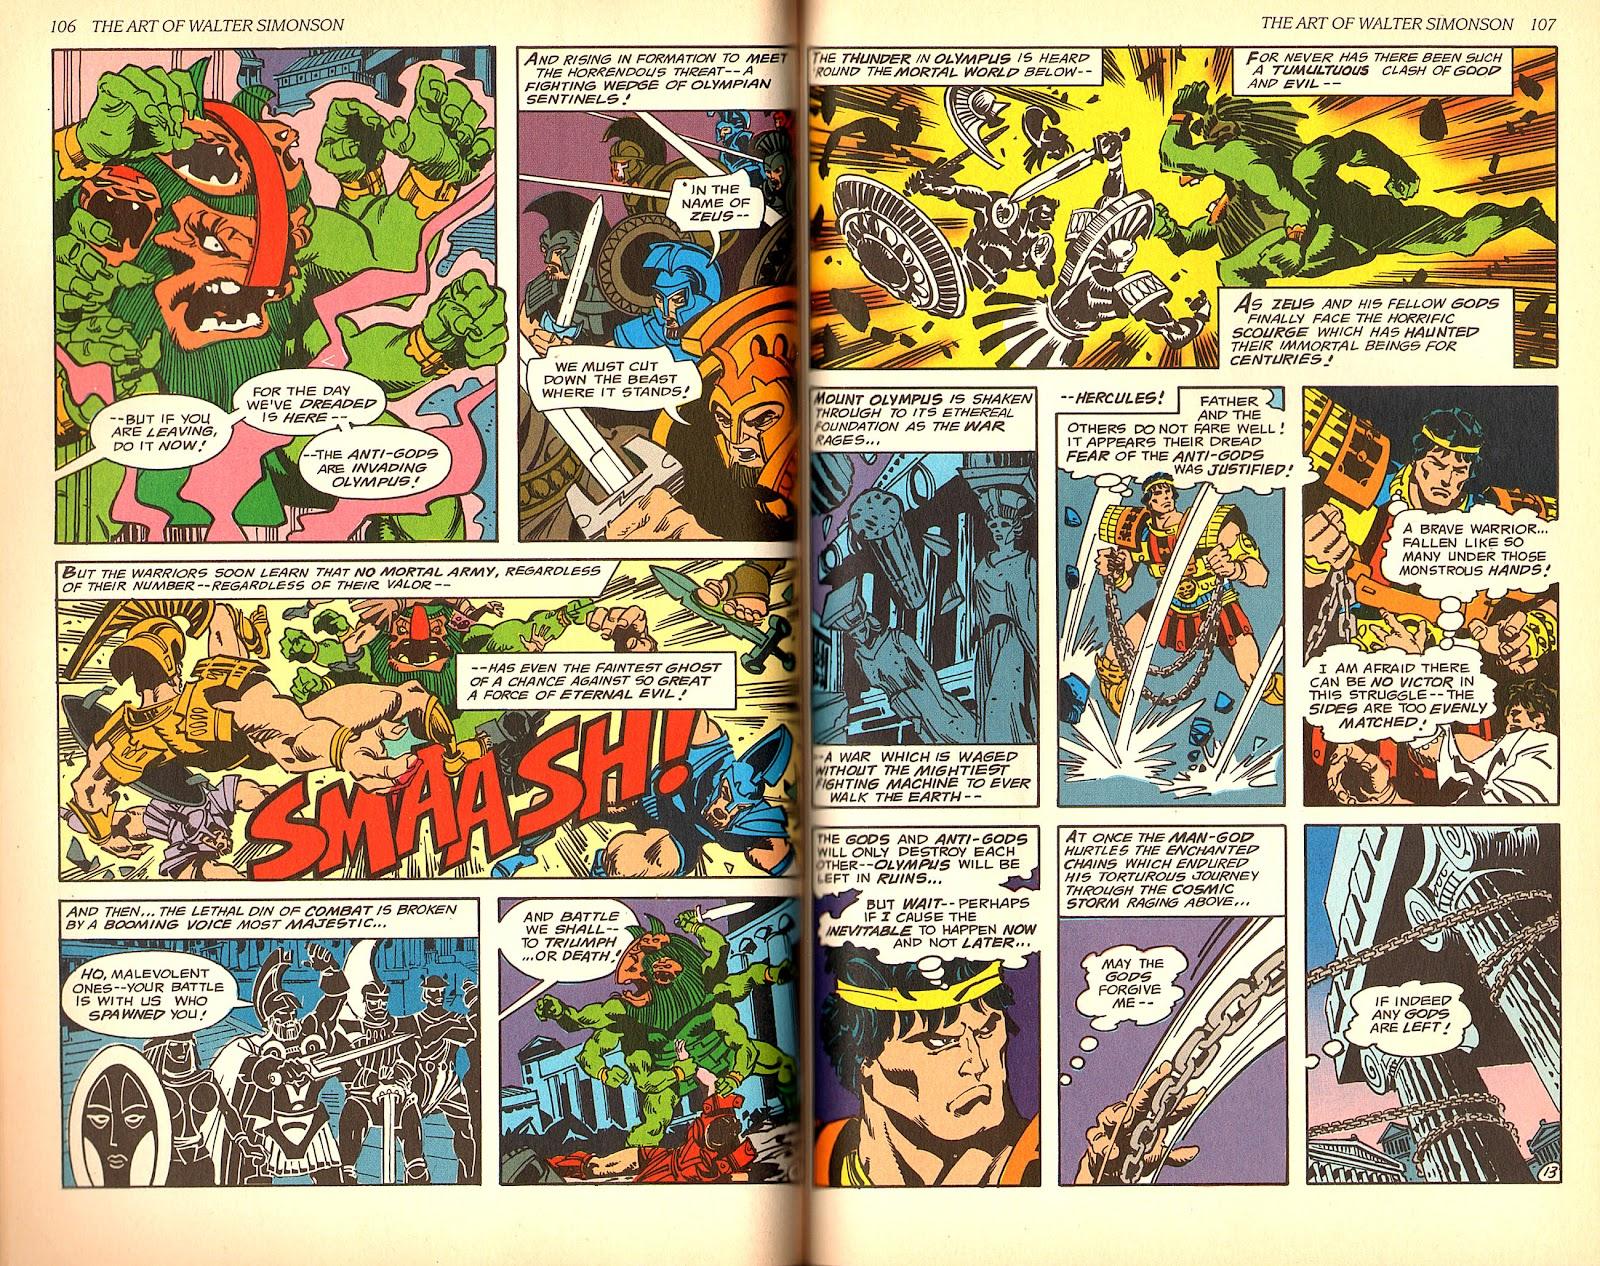 Read online The Art of Walter Simonson comic -  Issue # TPB - 55